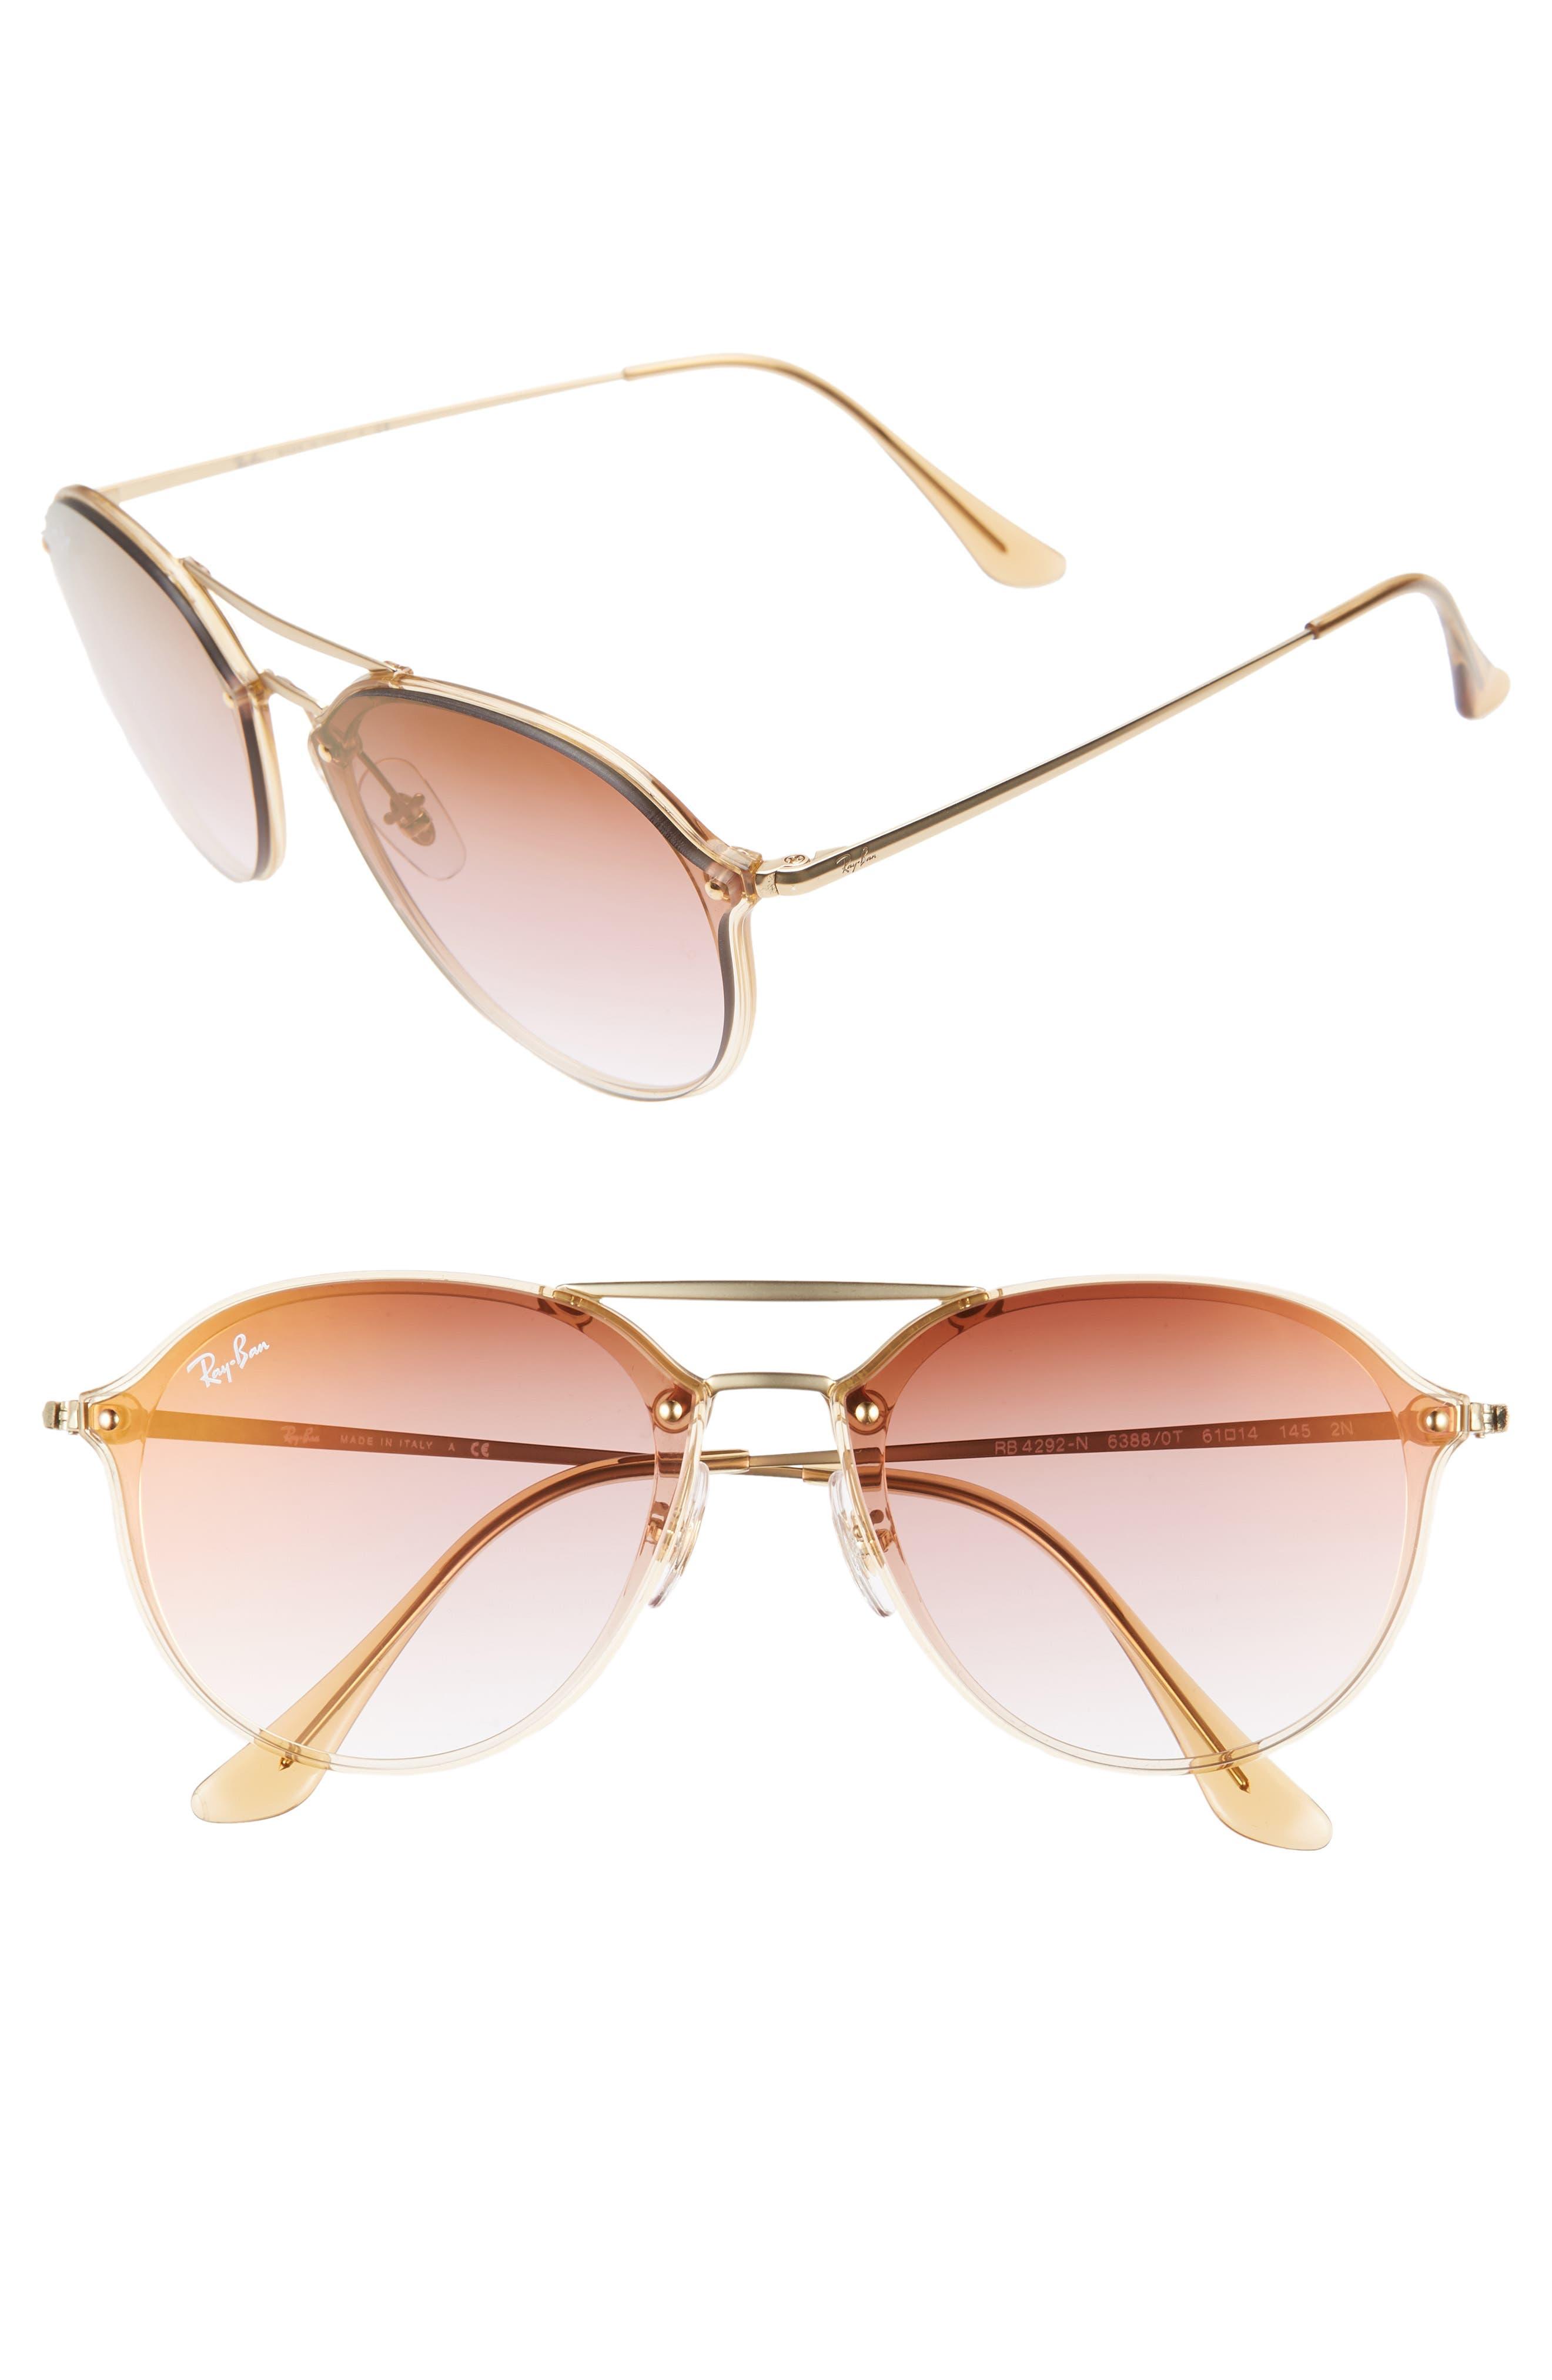 RAY-BAN, 61mm Gradient Aviator Sunglasses, Main thumbnail 1, color, GOLD/ BROWN GRADIENT